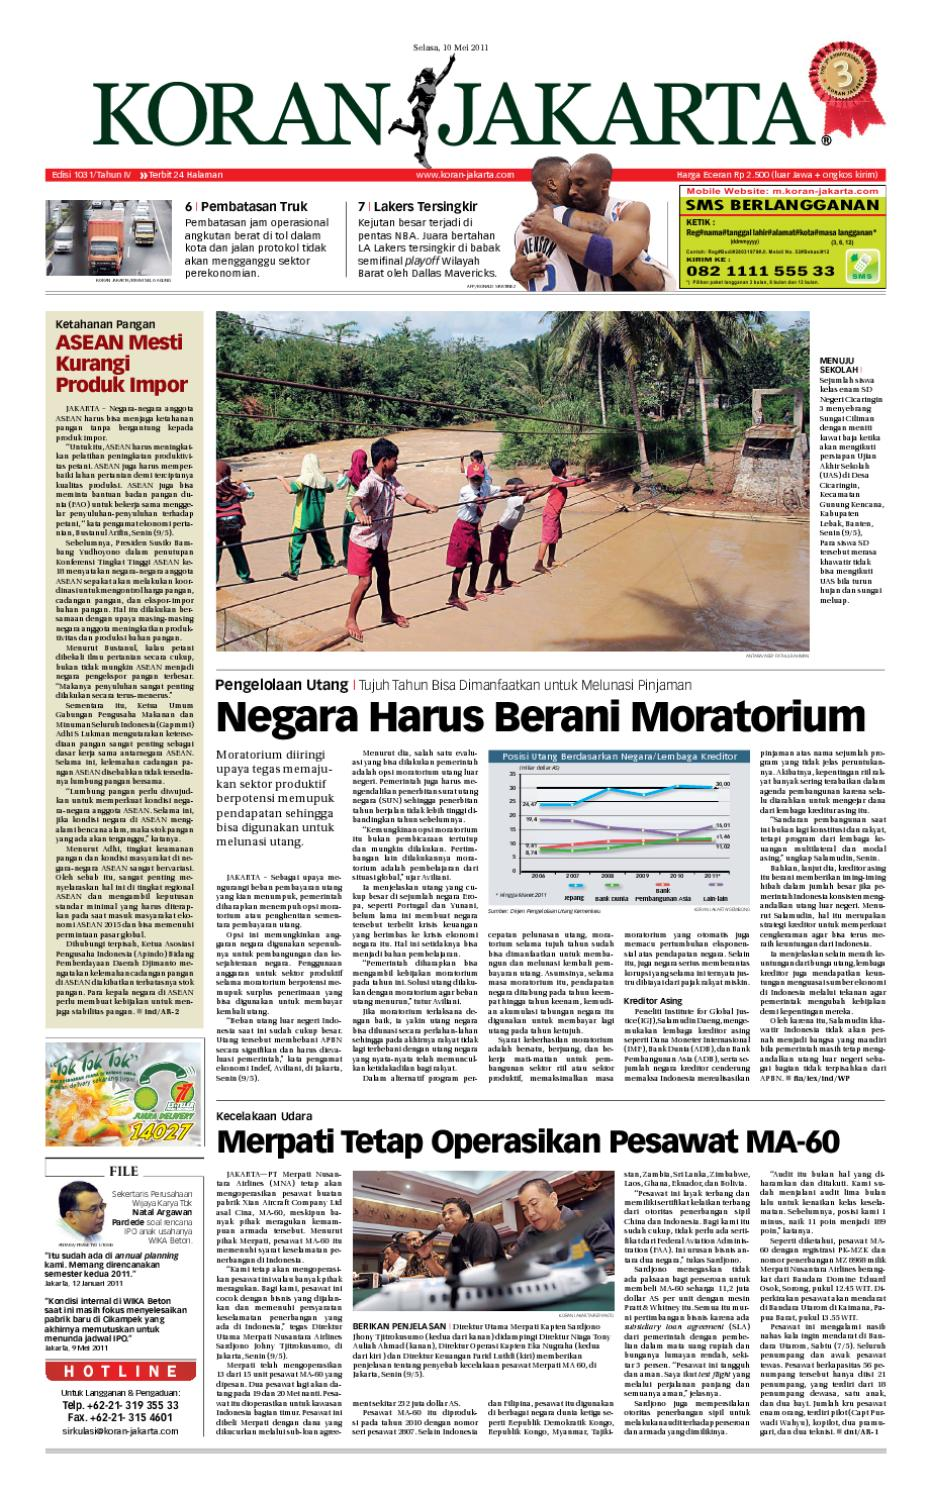 Edisi 1031 10 Mei 2011 By Pt Berita Nusantara Issuu Kunci Ring Pas Only Crv Satin Finished Tomeco 13m M